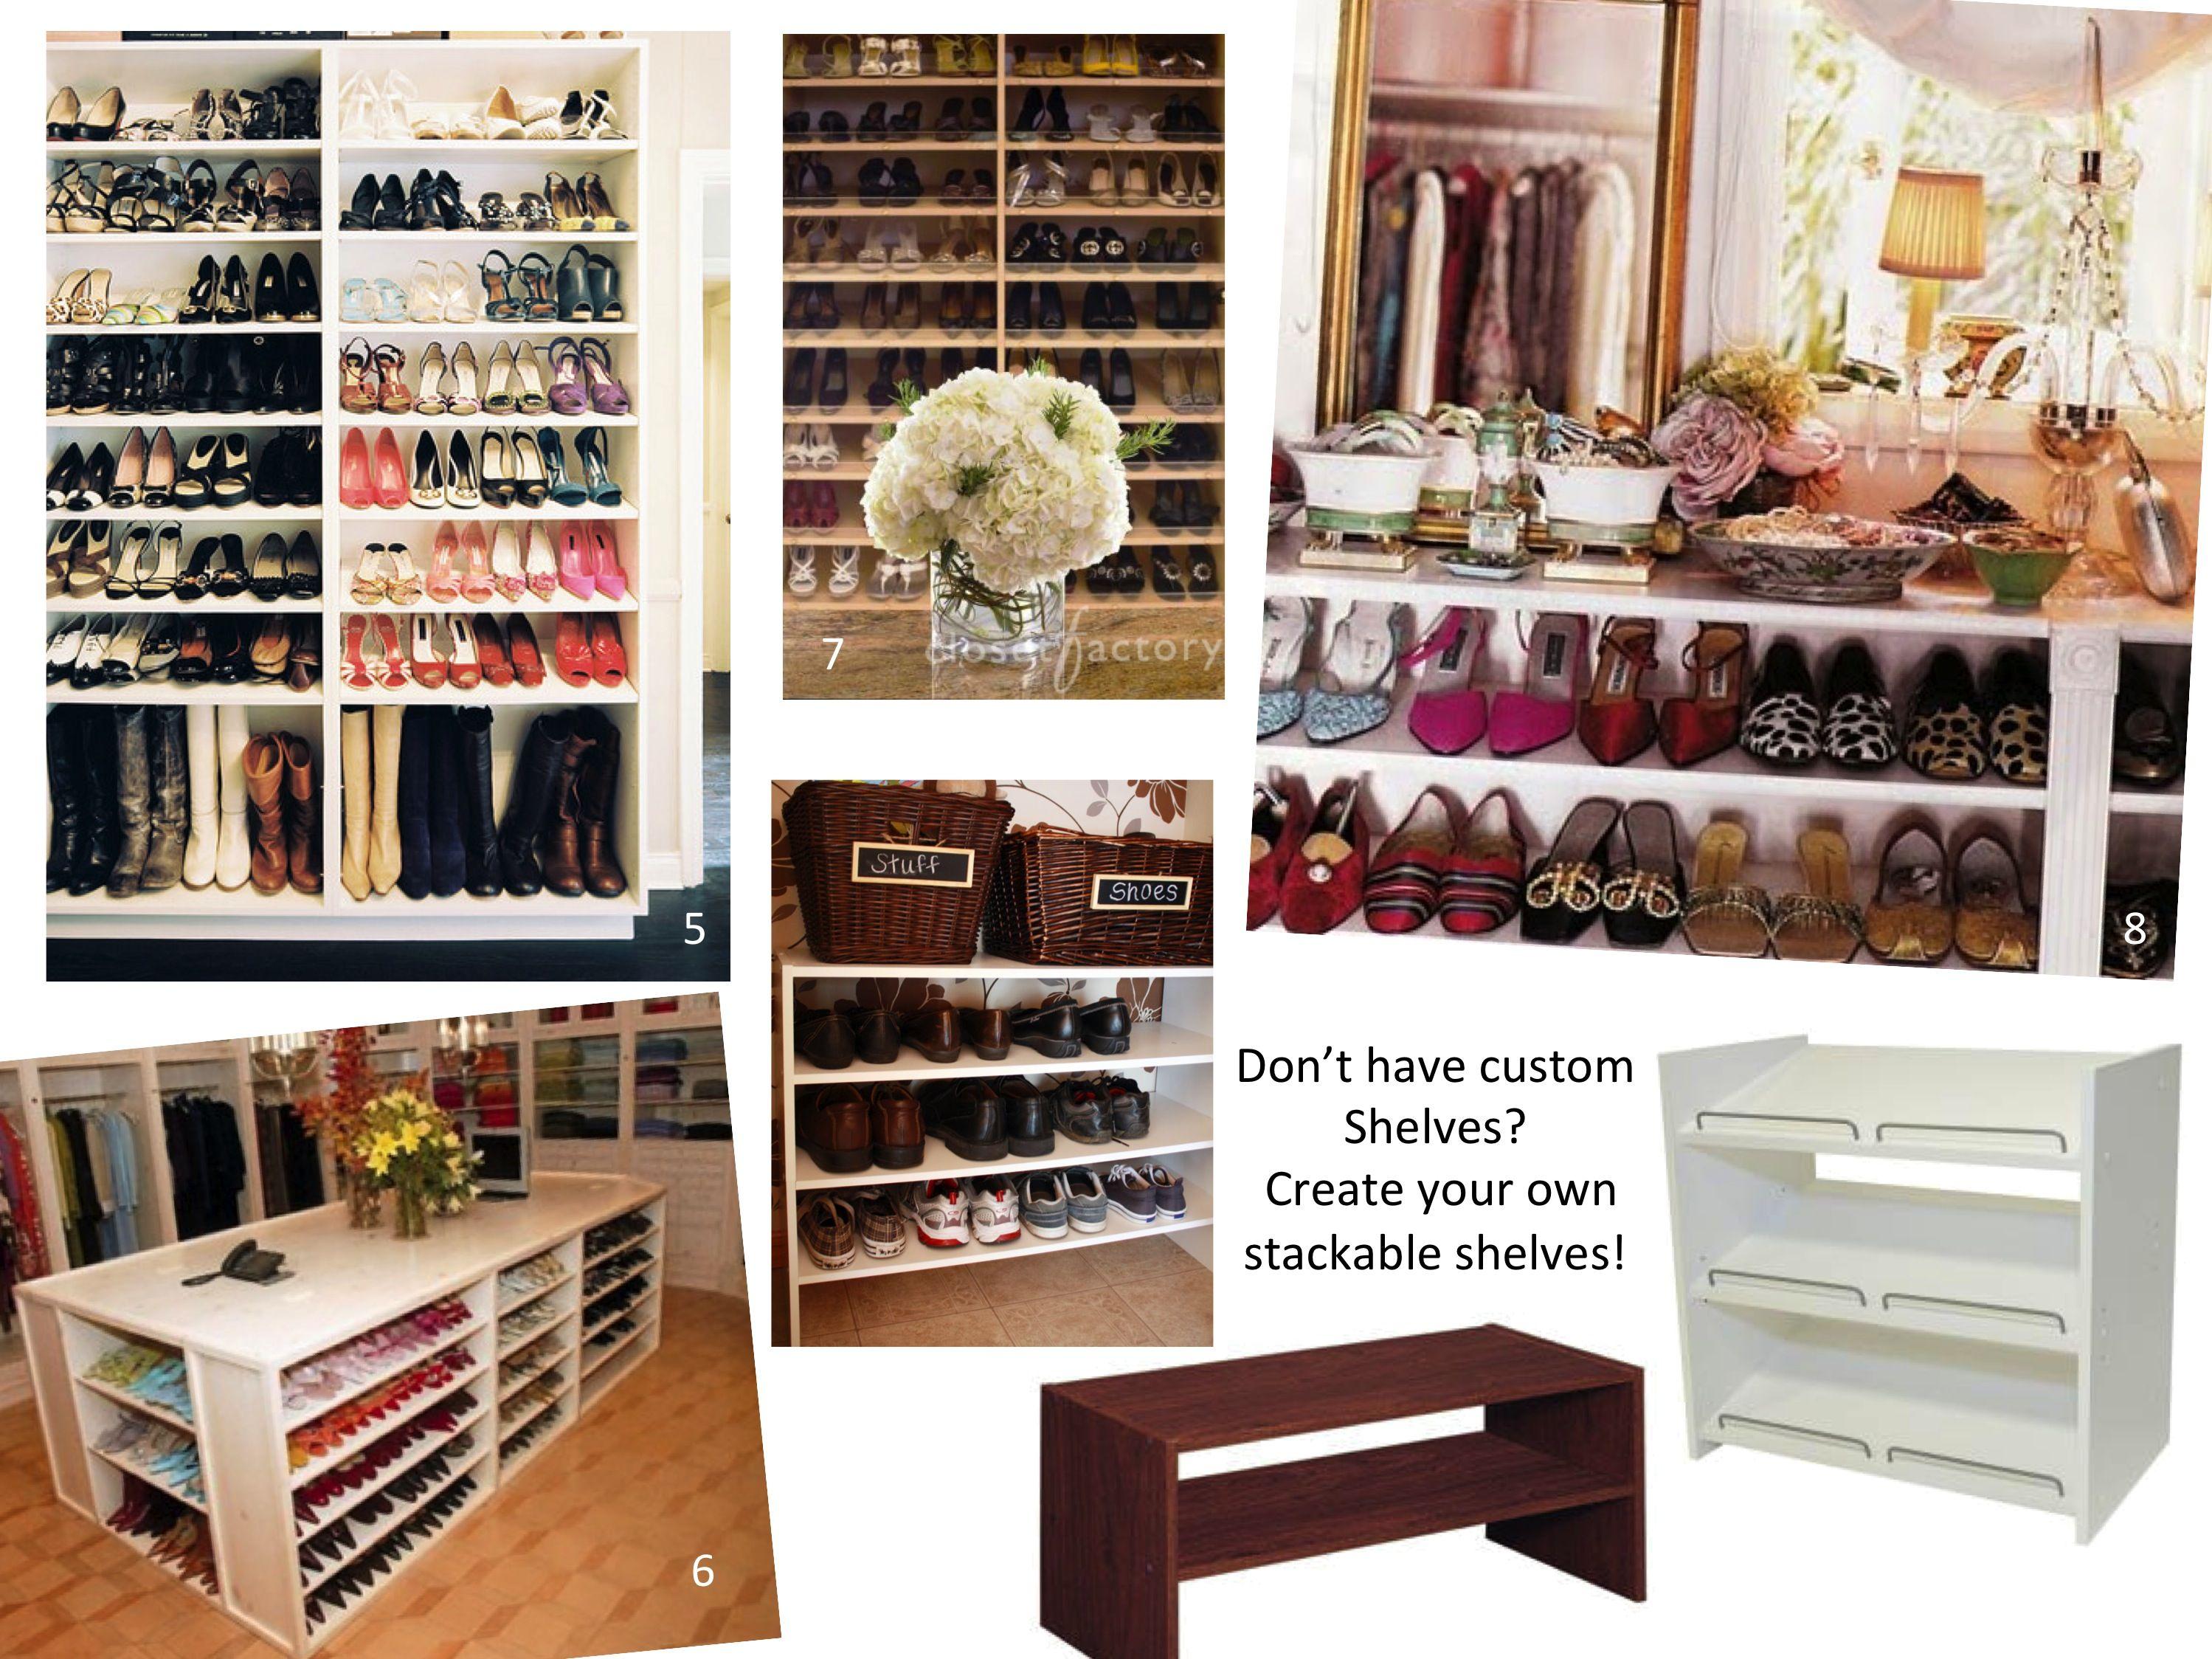 ikea bedroom closet shoe  | Closet Organization Ideas 2998x2248 35 Shoe Organization Ideas I De ...